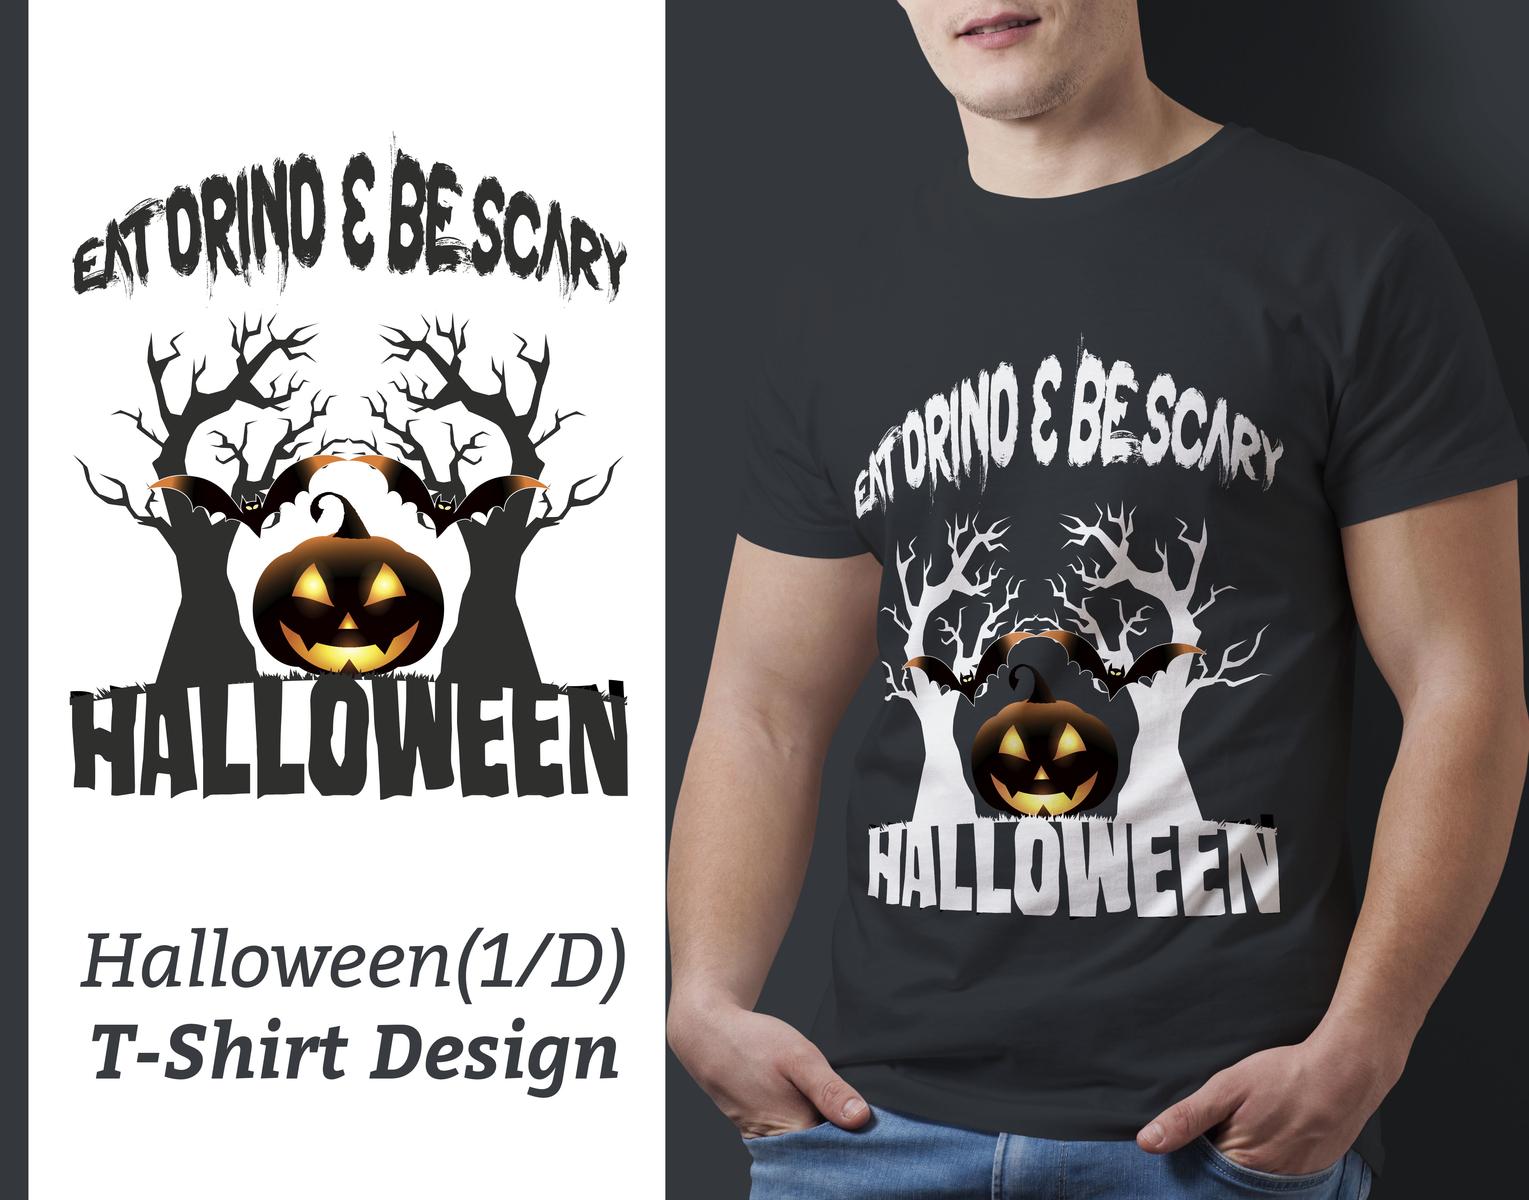 halloween t-shirt design, halloween, t-shirtimran hasan imu